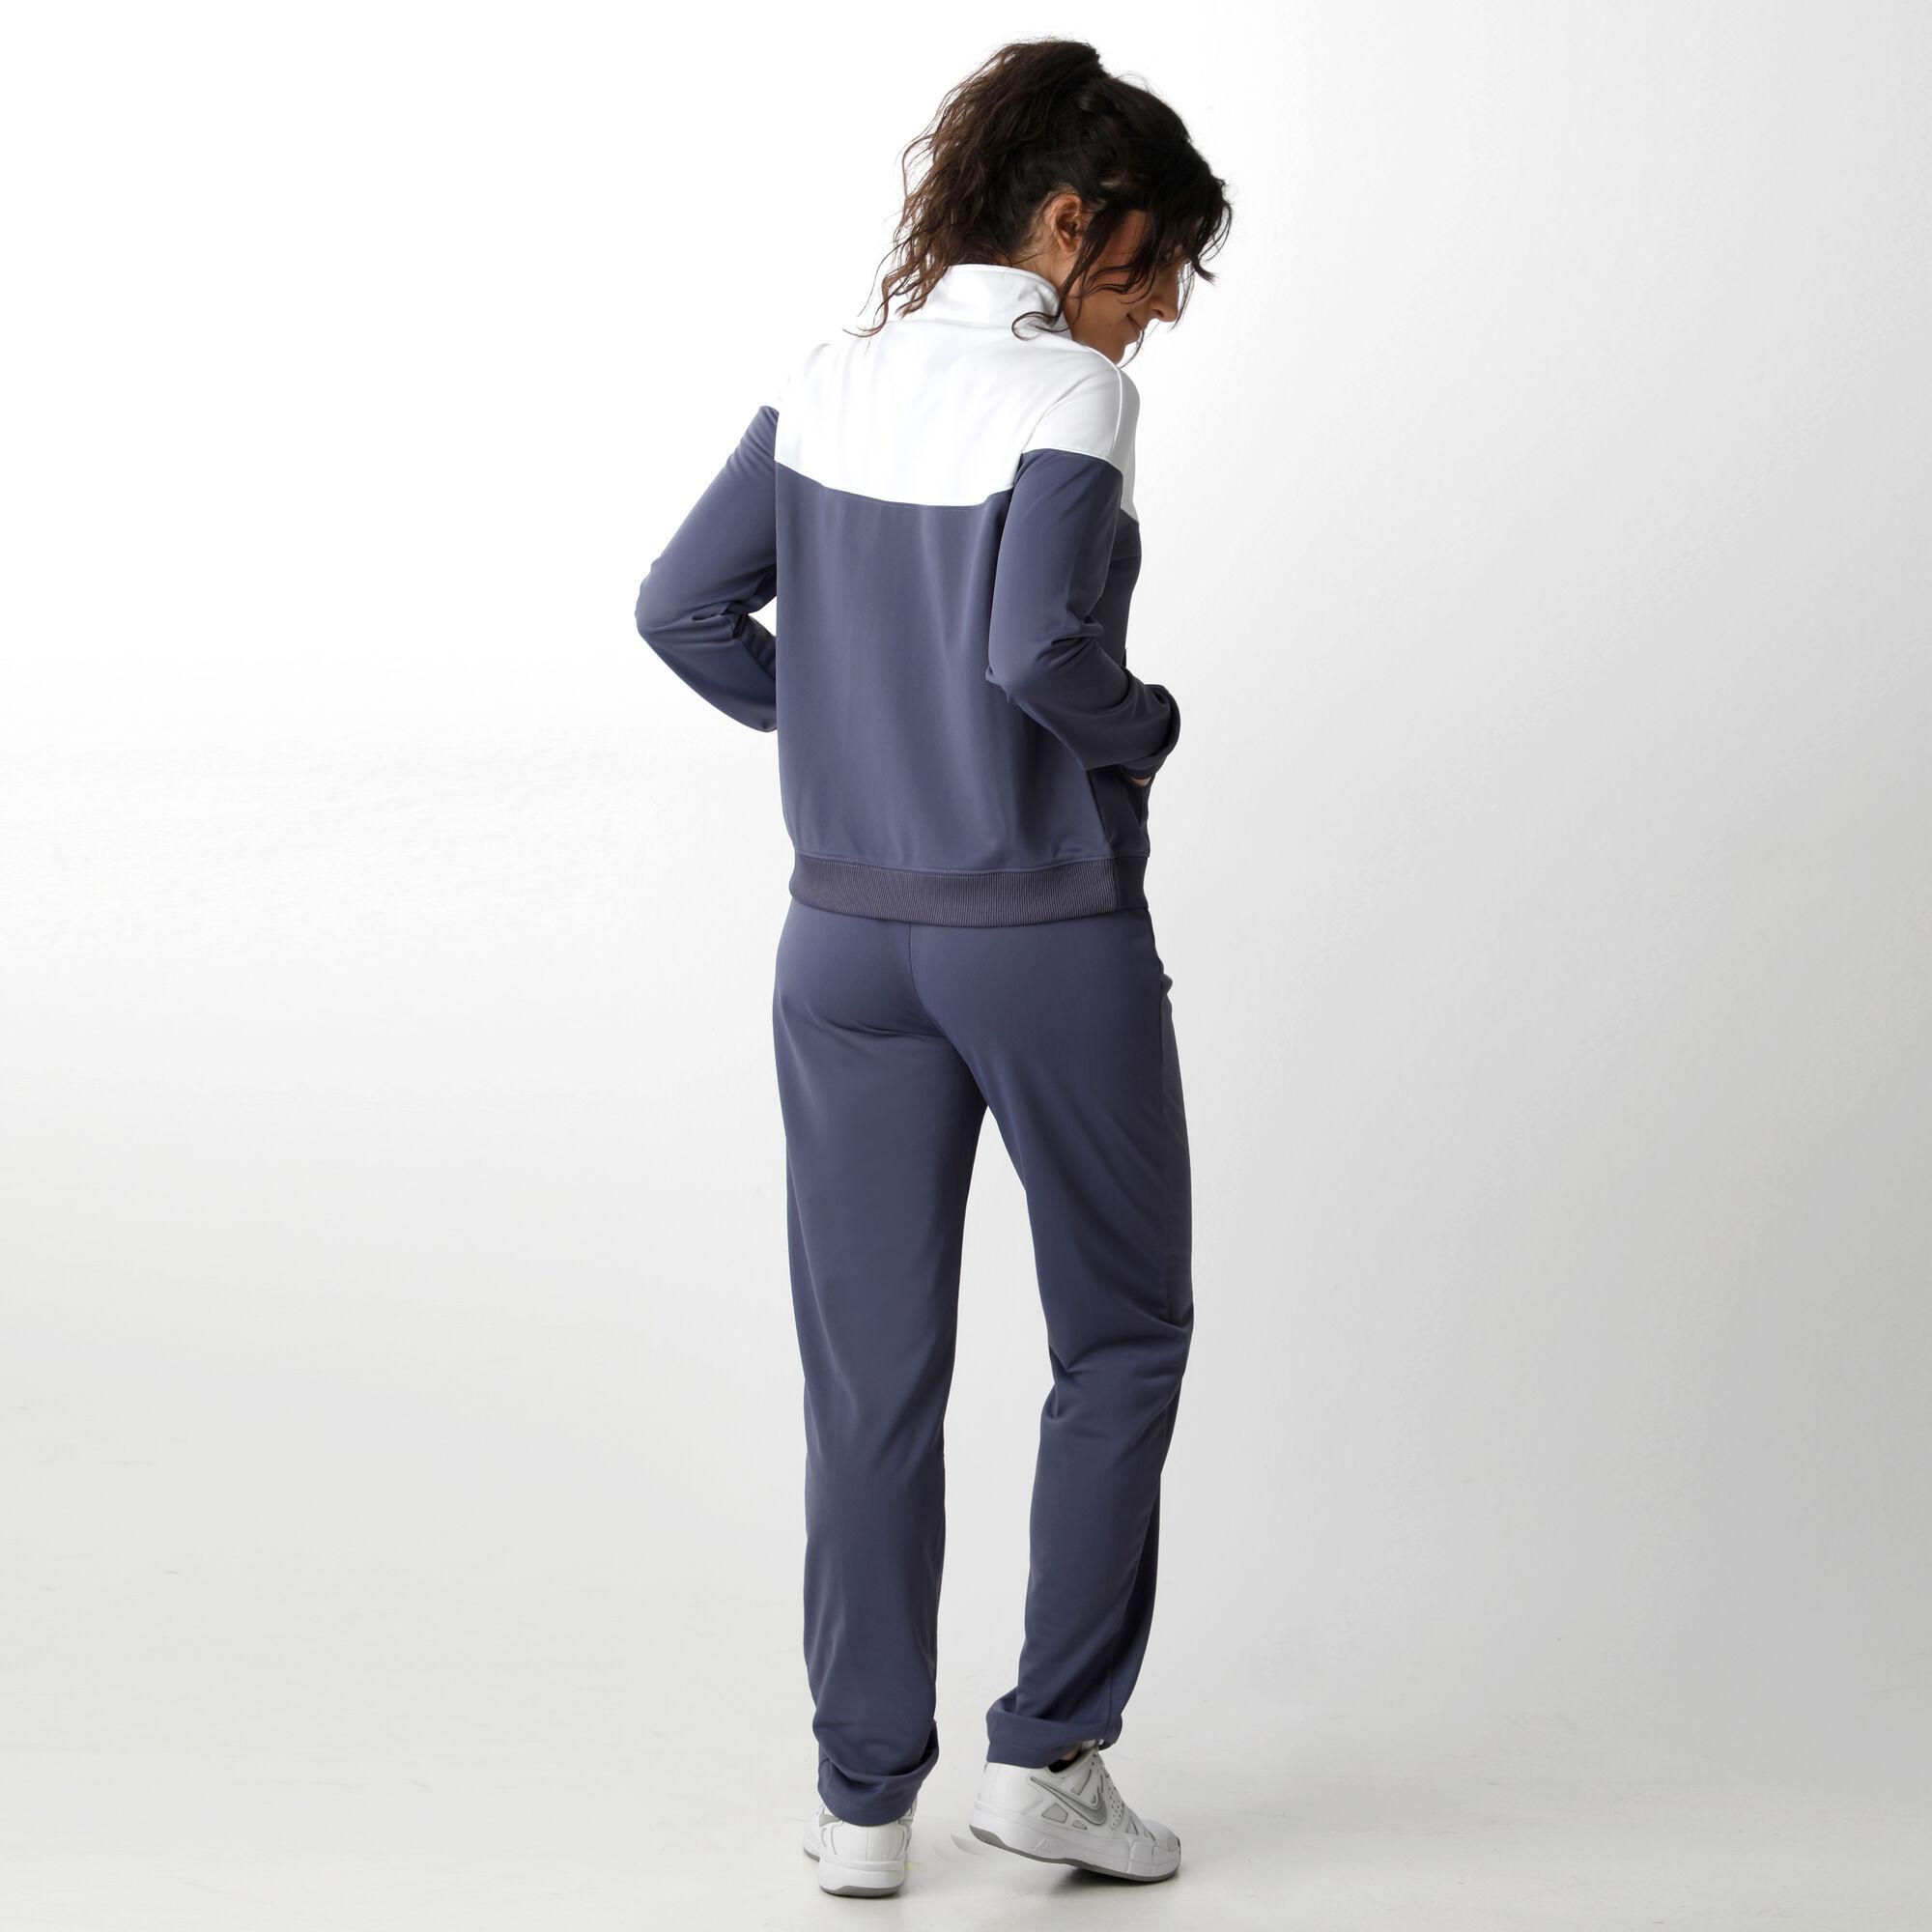 Damen Trainingsanzug Nike